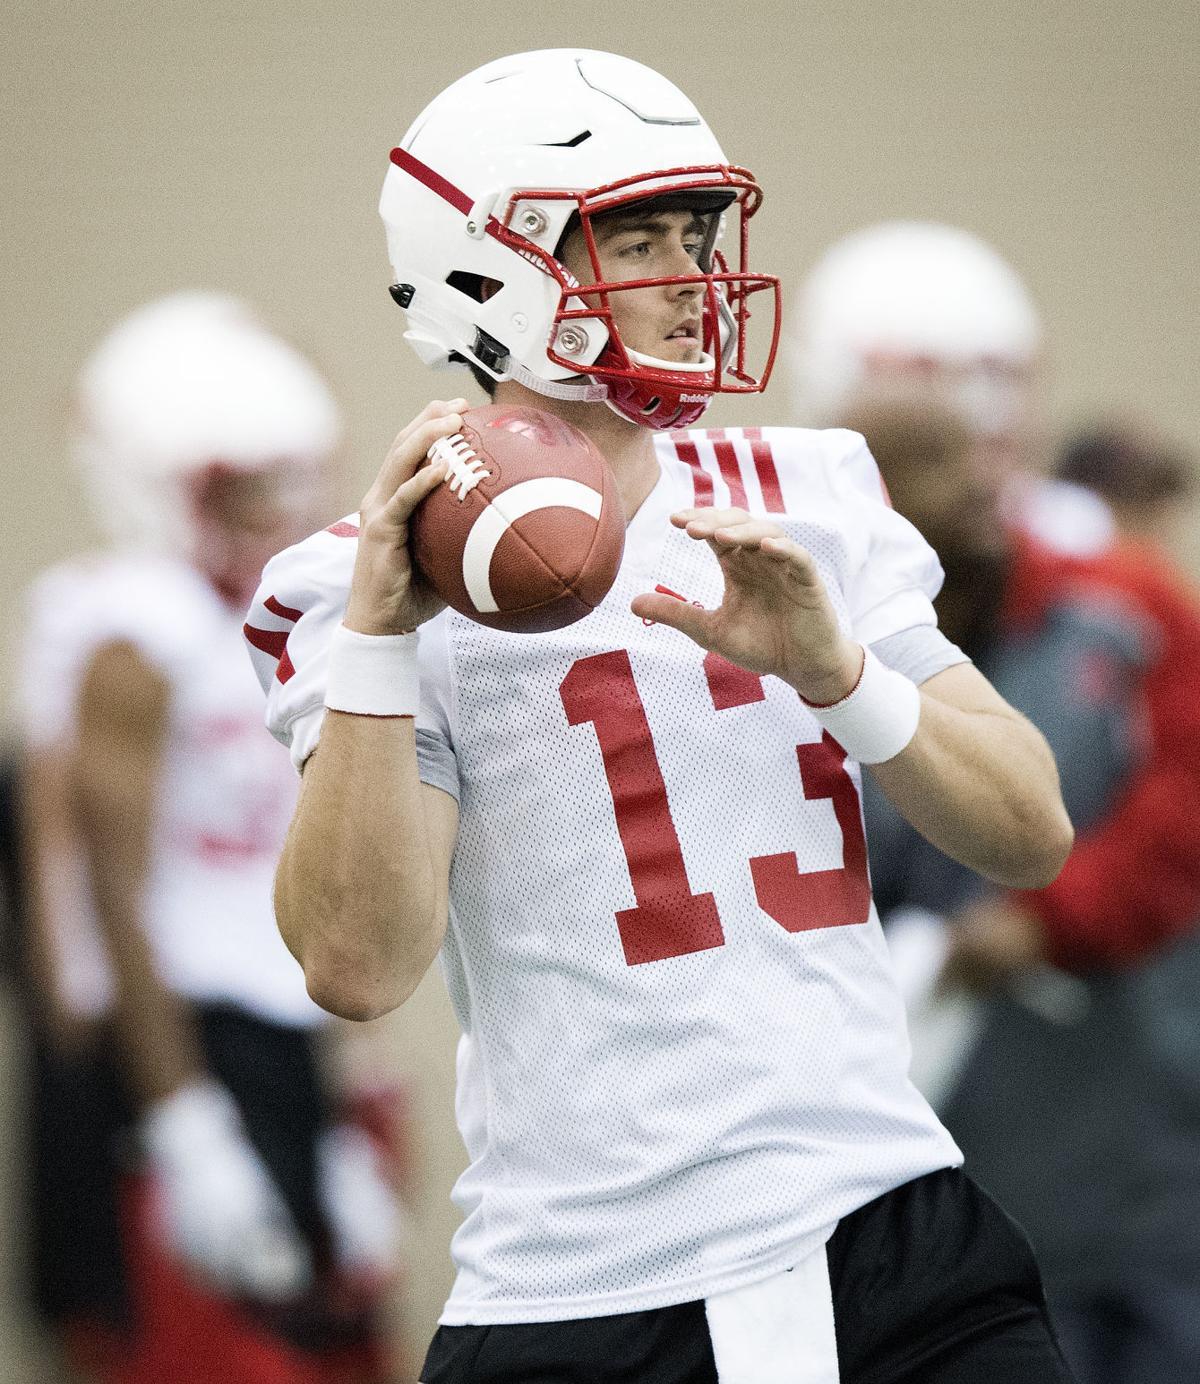 Nebraska First Football Practice of the Upcoming Season, 8.4.16